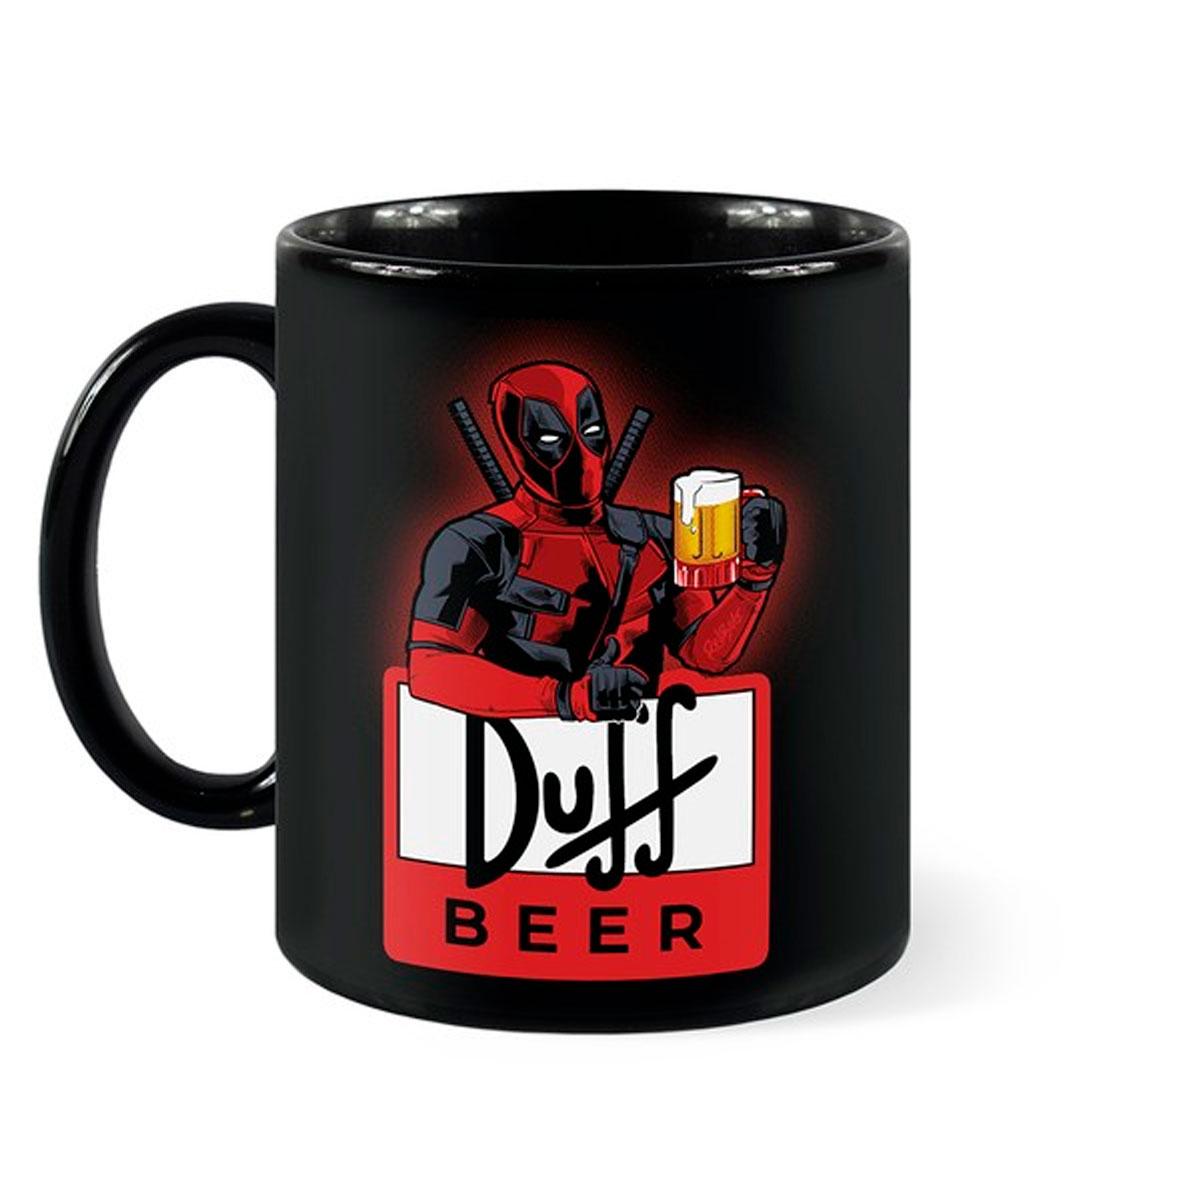 Caneca DeadPool Duff Beer Deadbeer - Presente Super